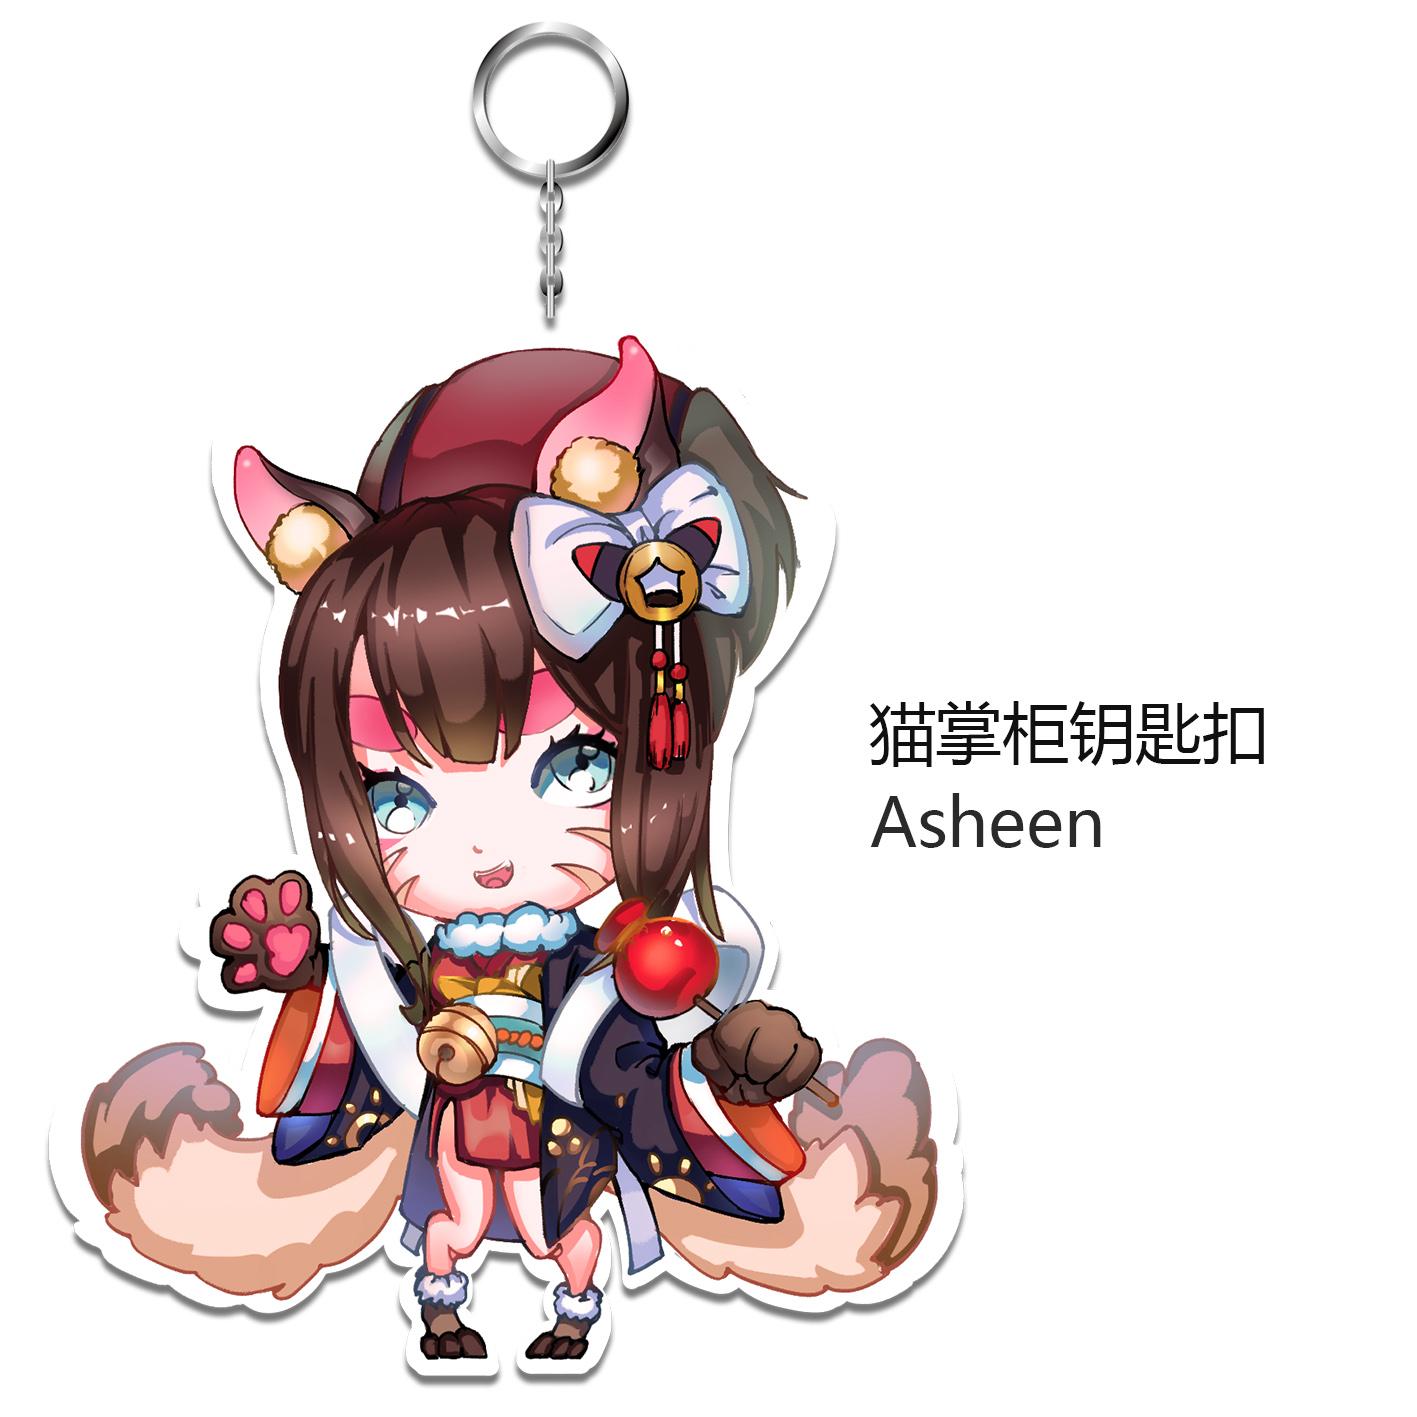 asheen-阴阳师猫掌柜-Q版【钥匙扣】.jpg